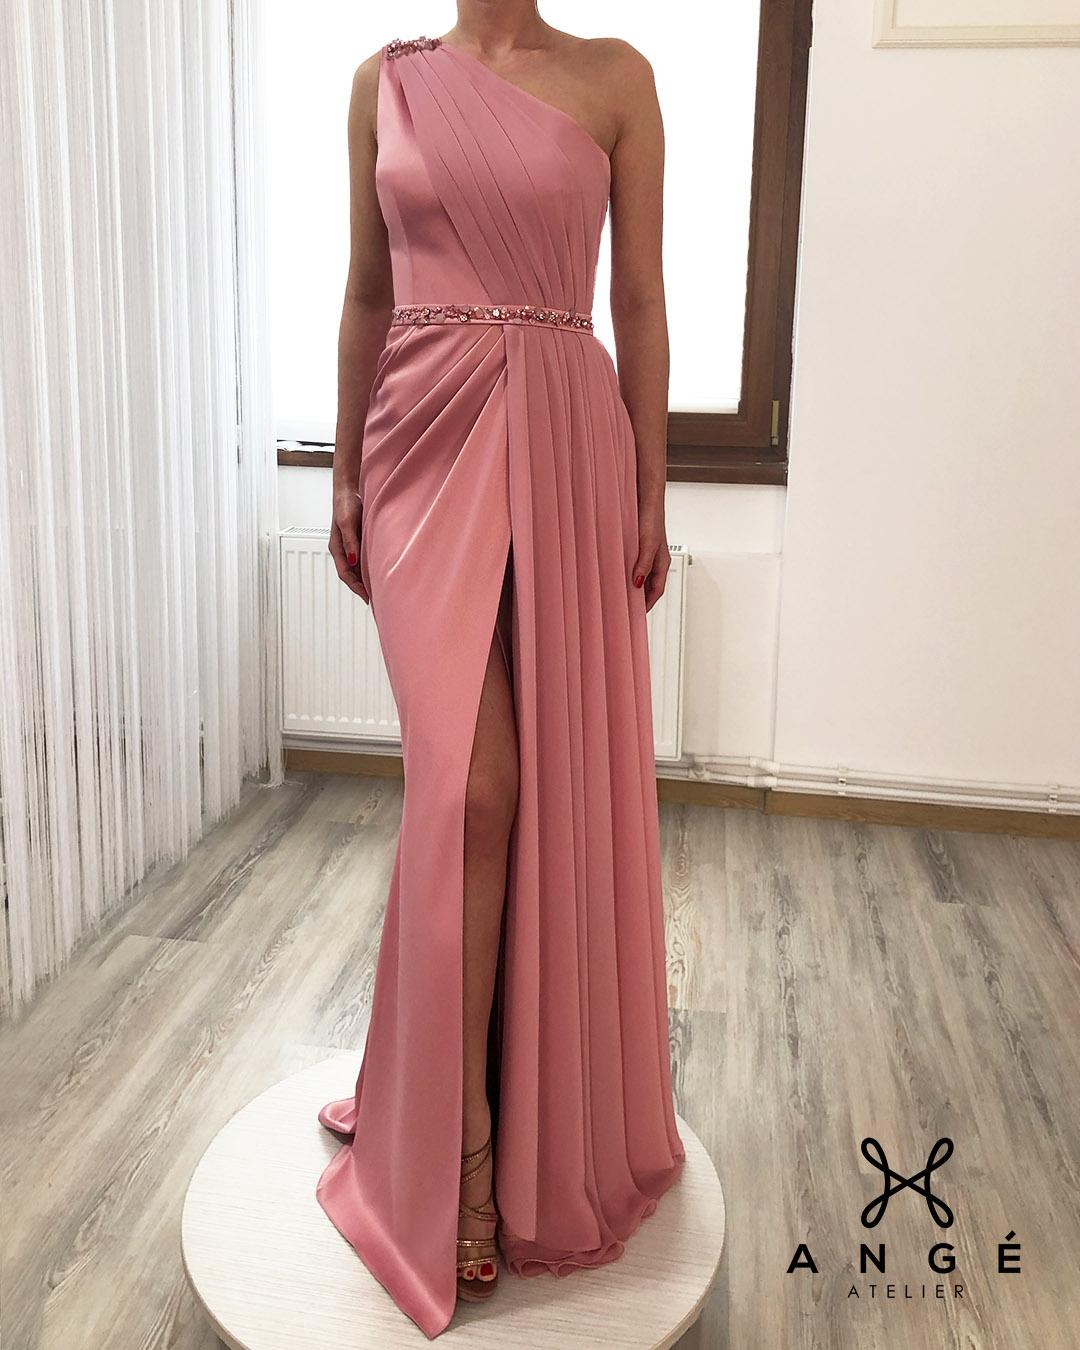 Rochie Umar Roz Prafuit Trena Voal Sirena Crapatura Accesorii Couture Model Bal Absolvire Banchet Nasa AngeAtelier